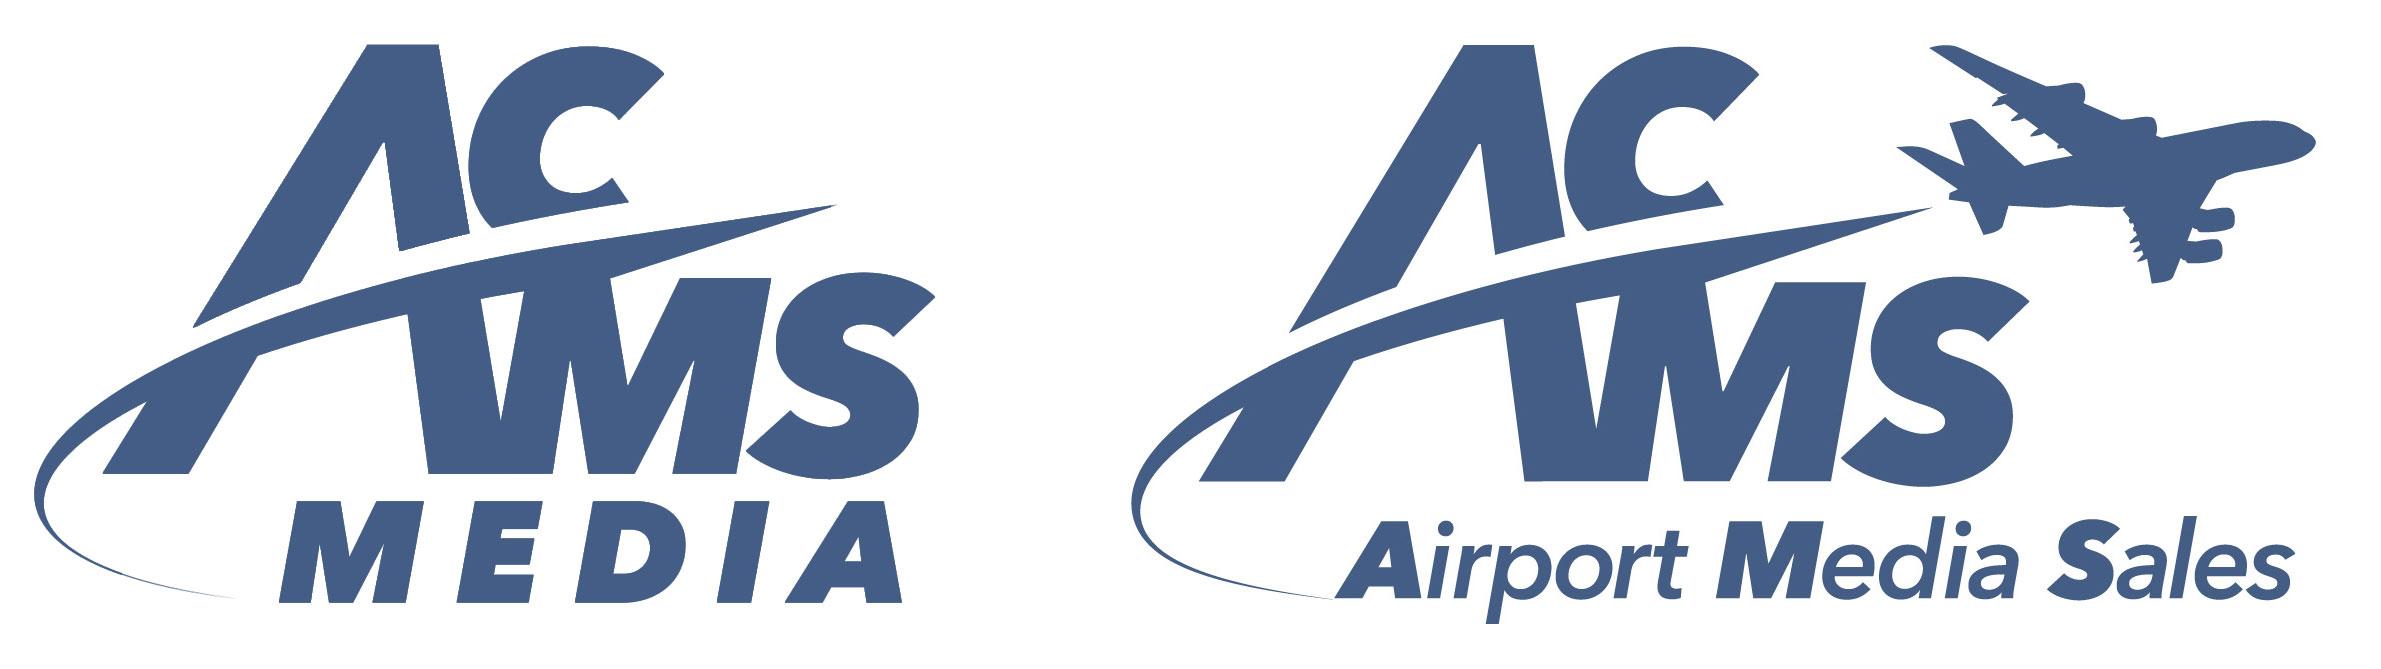 Airport Media Sales